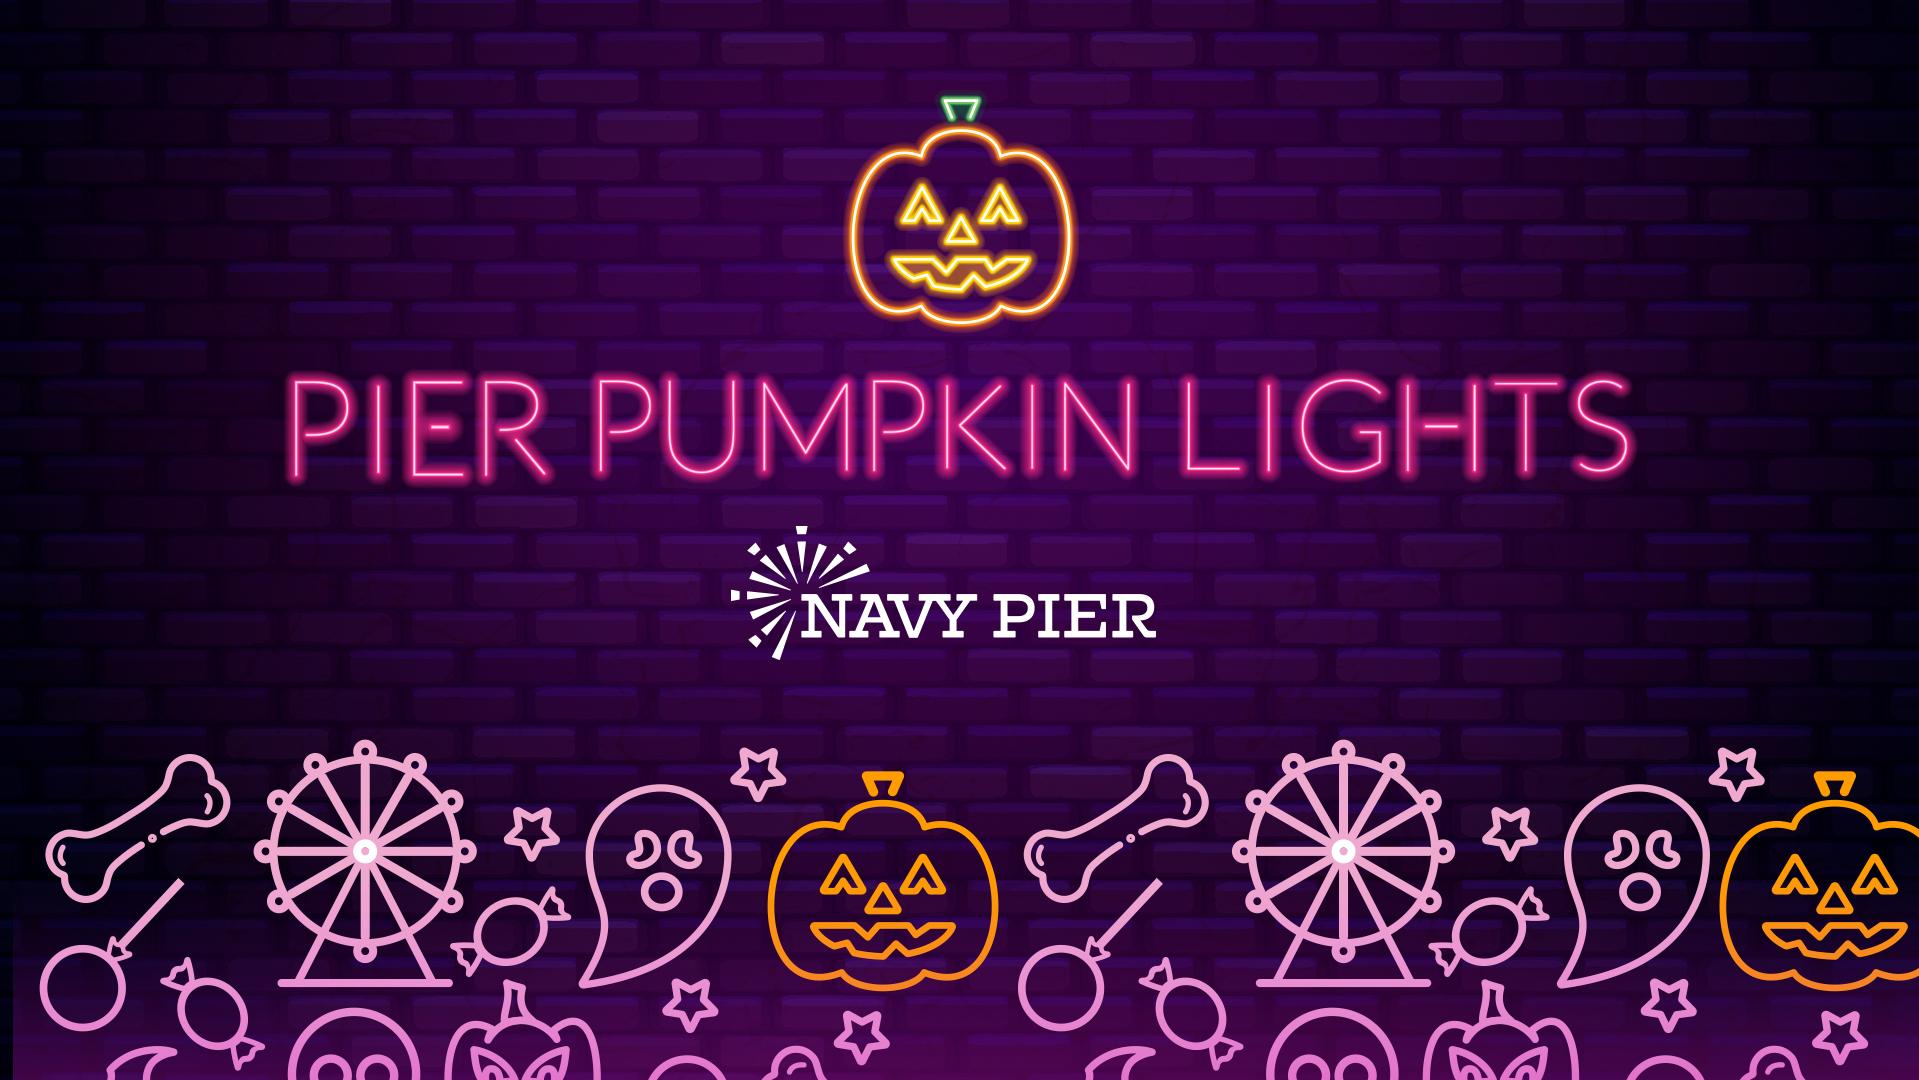 Navy Pier Presents Pier Pumpkin Lights: Chicago's Newest, Free Pumpkin Pop-up Experience